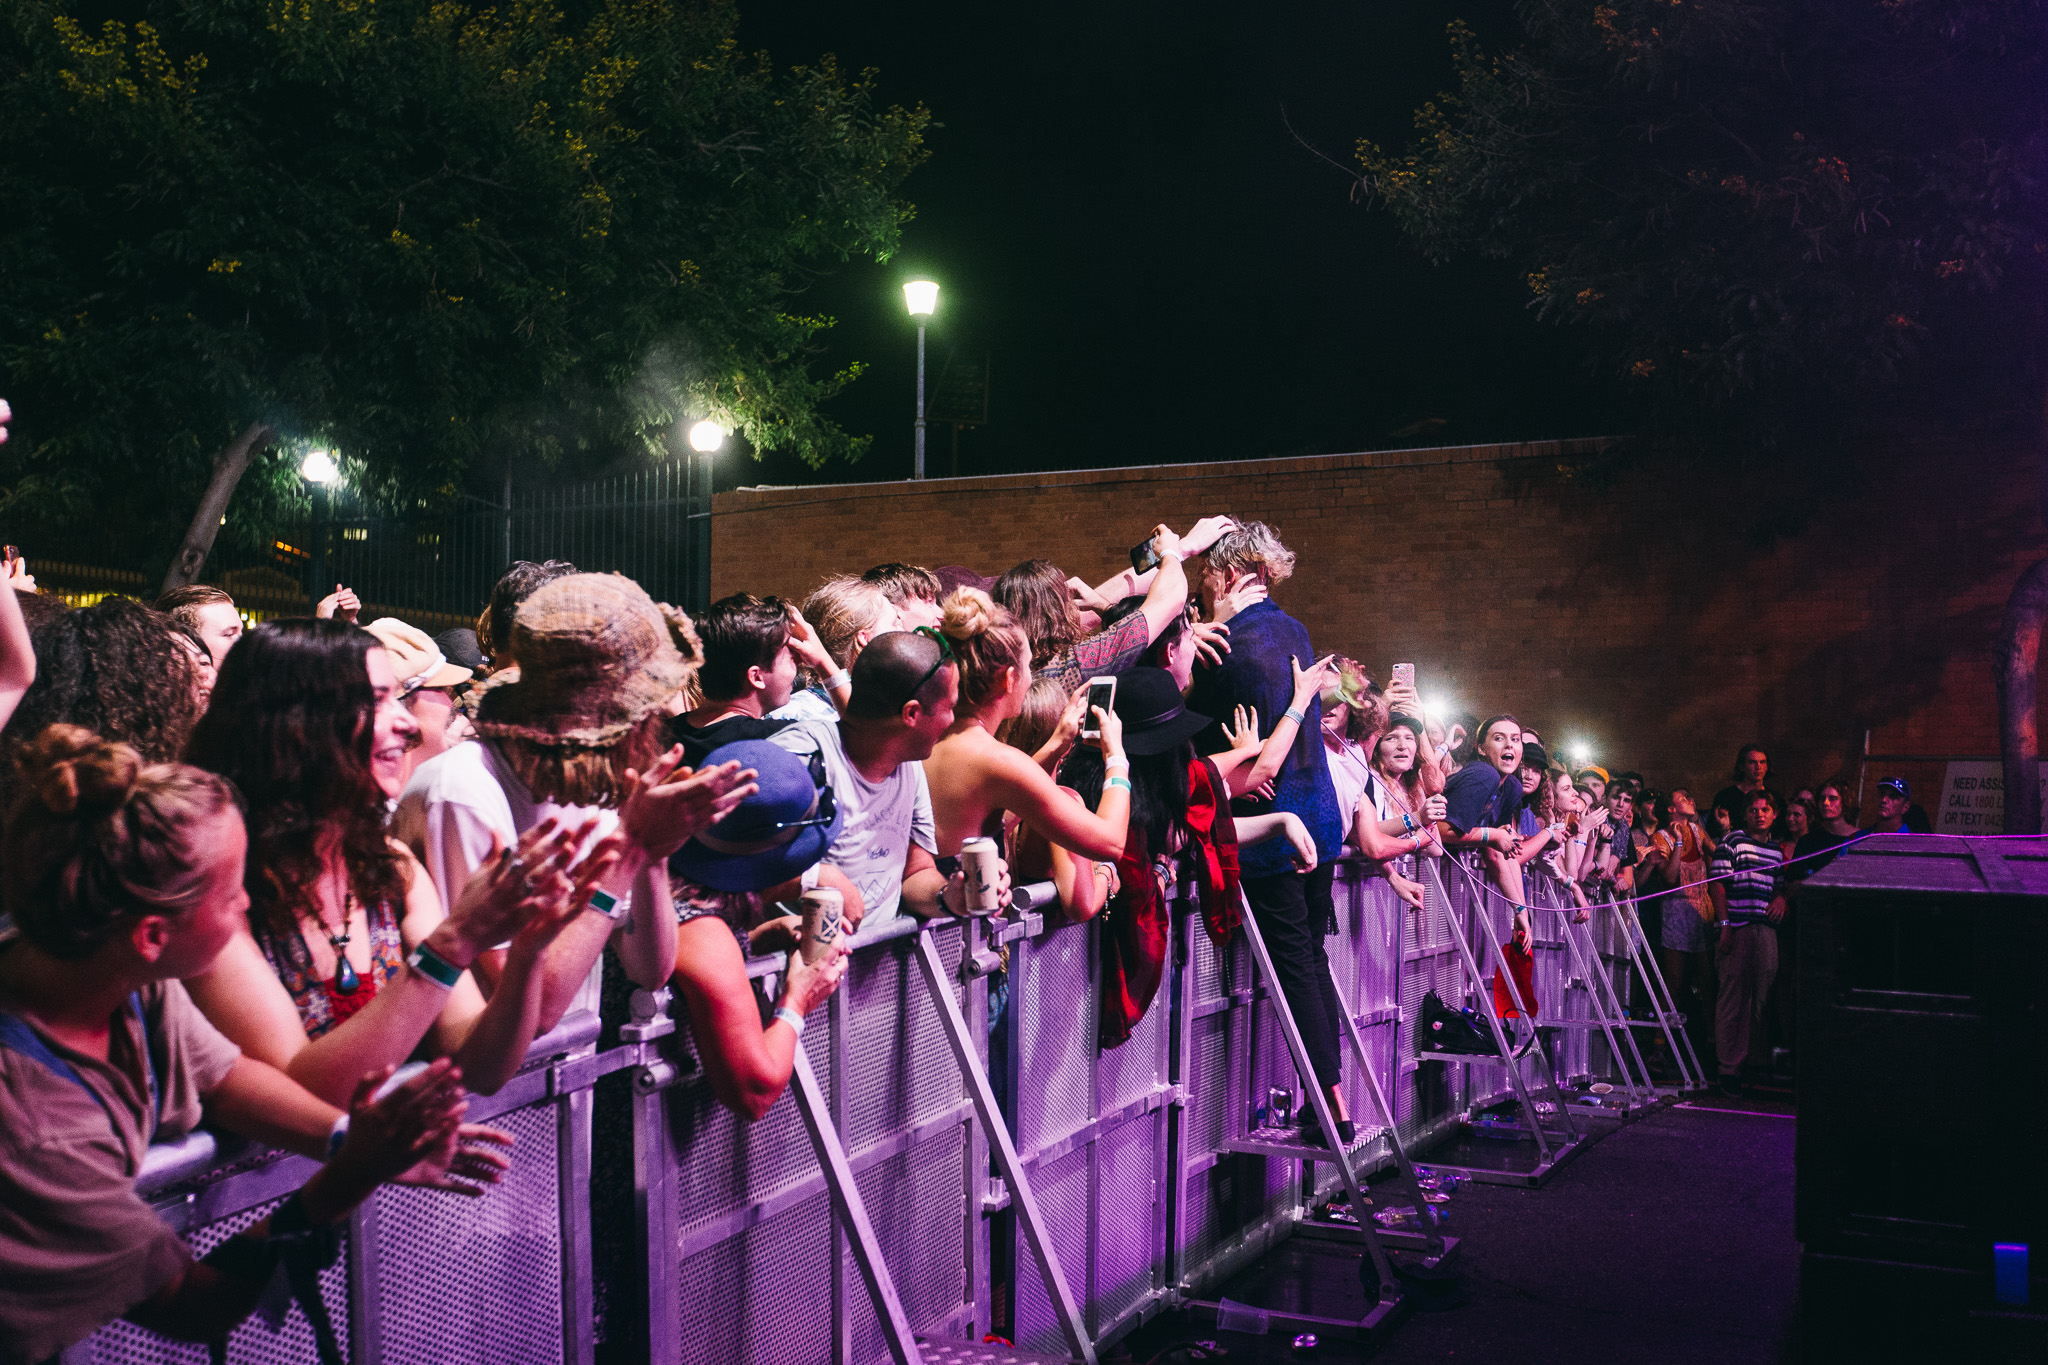 POND_Laneway-Festival-Brisbane-2018_Credit-Bianca-Holderness-6.jpg